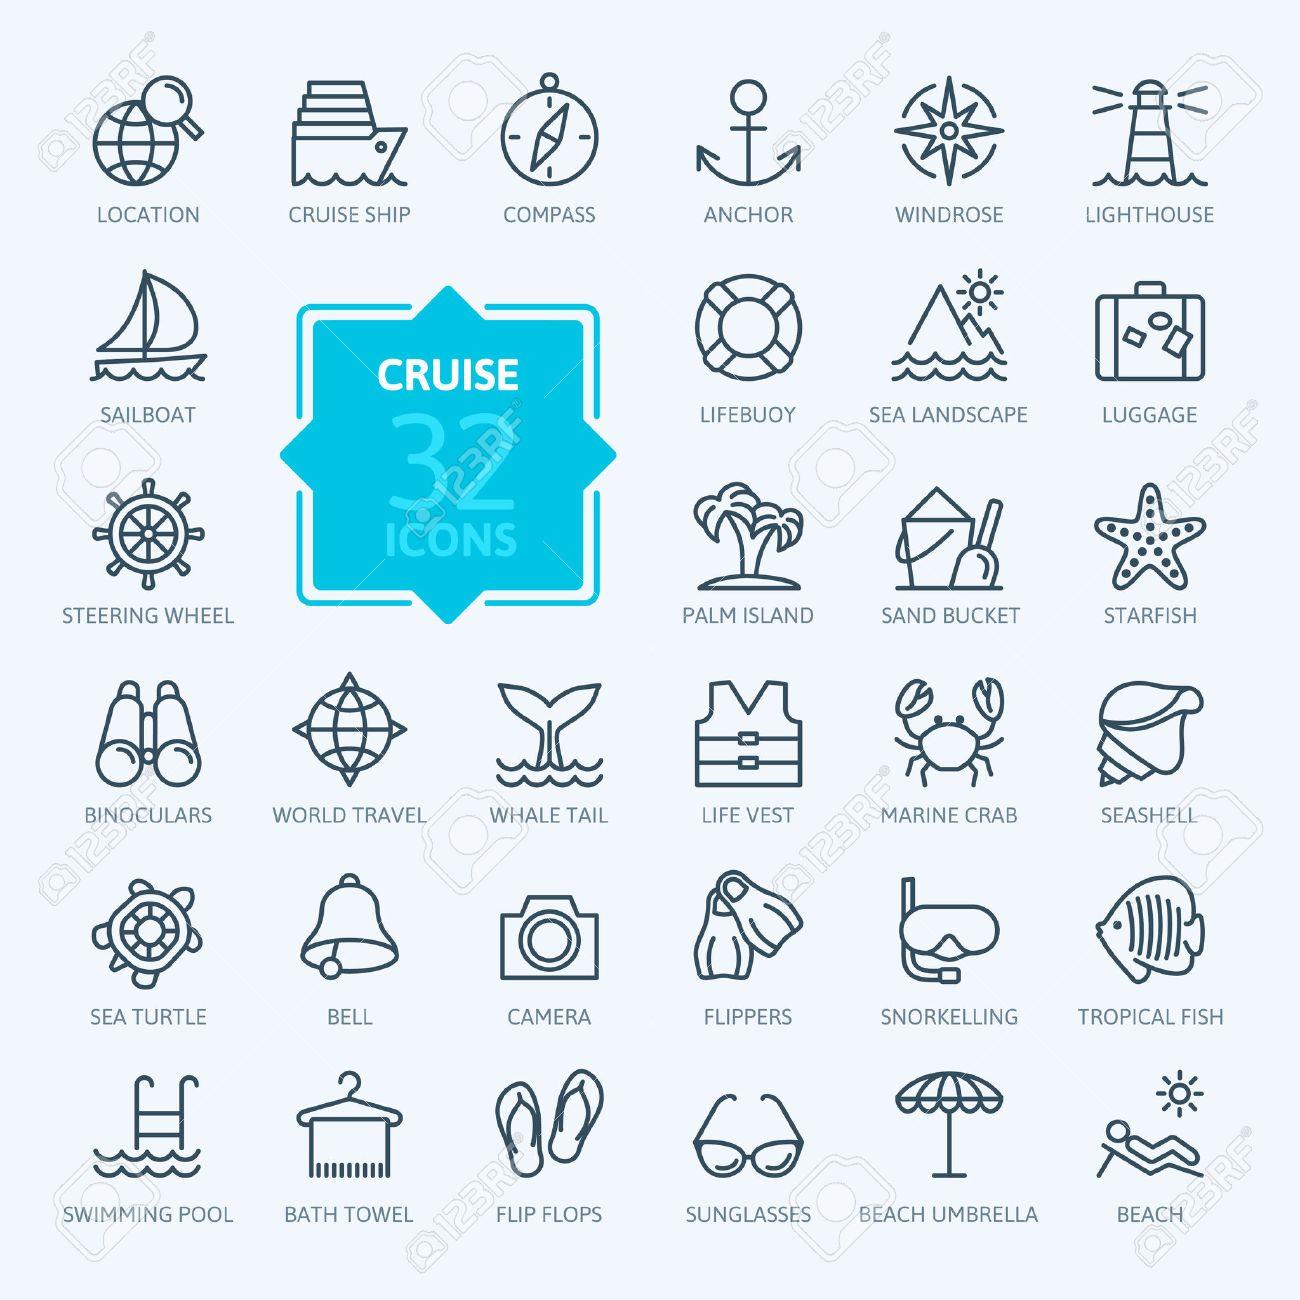 Outline web icon set - journey, vacation, cruise - 44710585